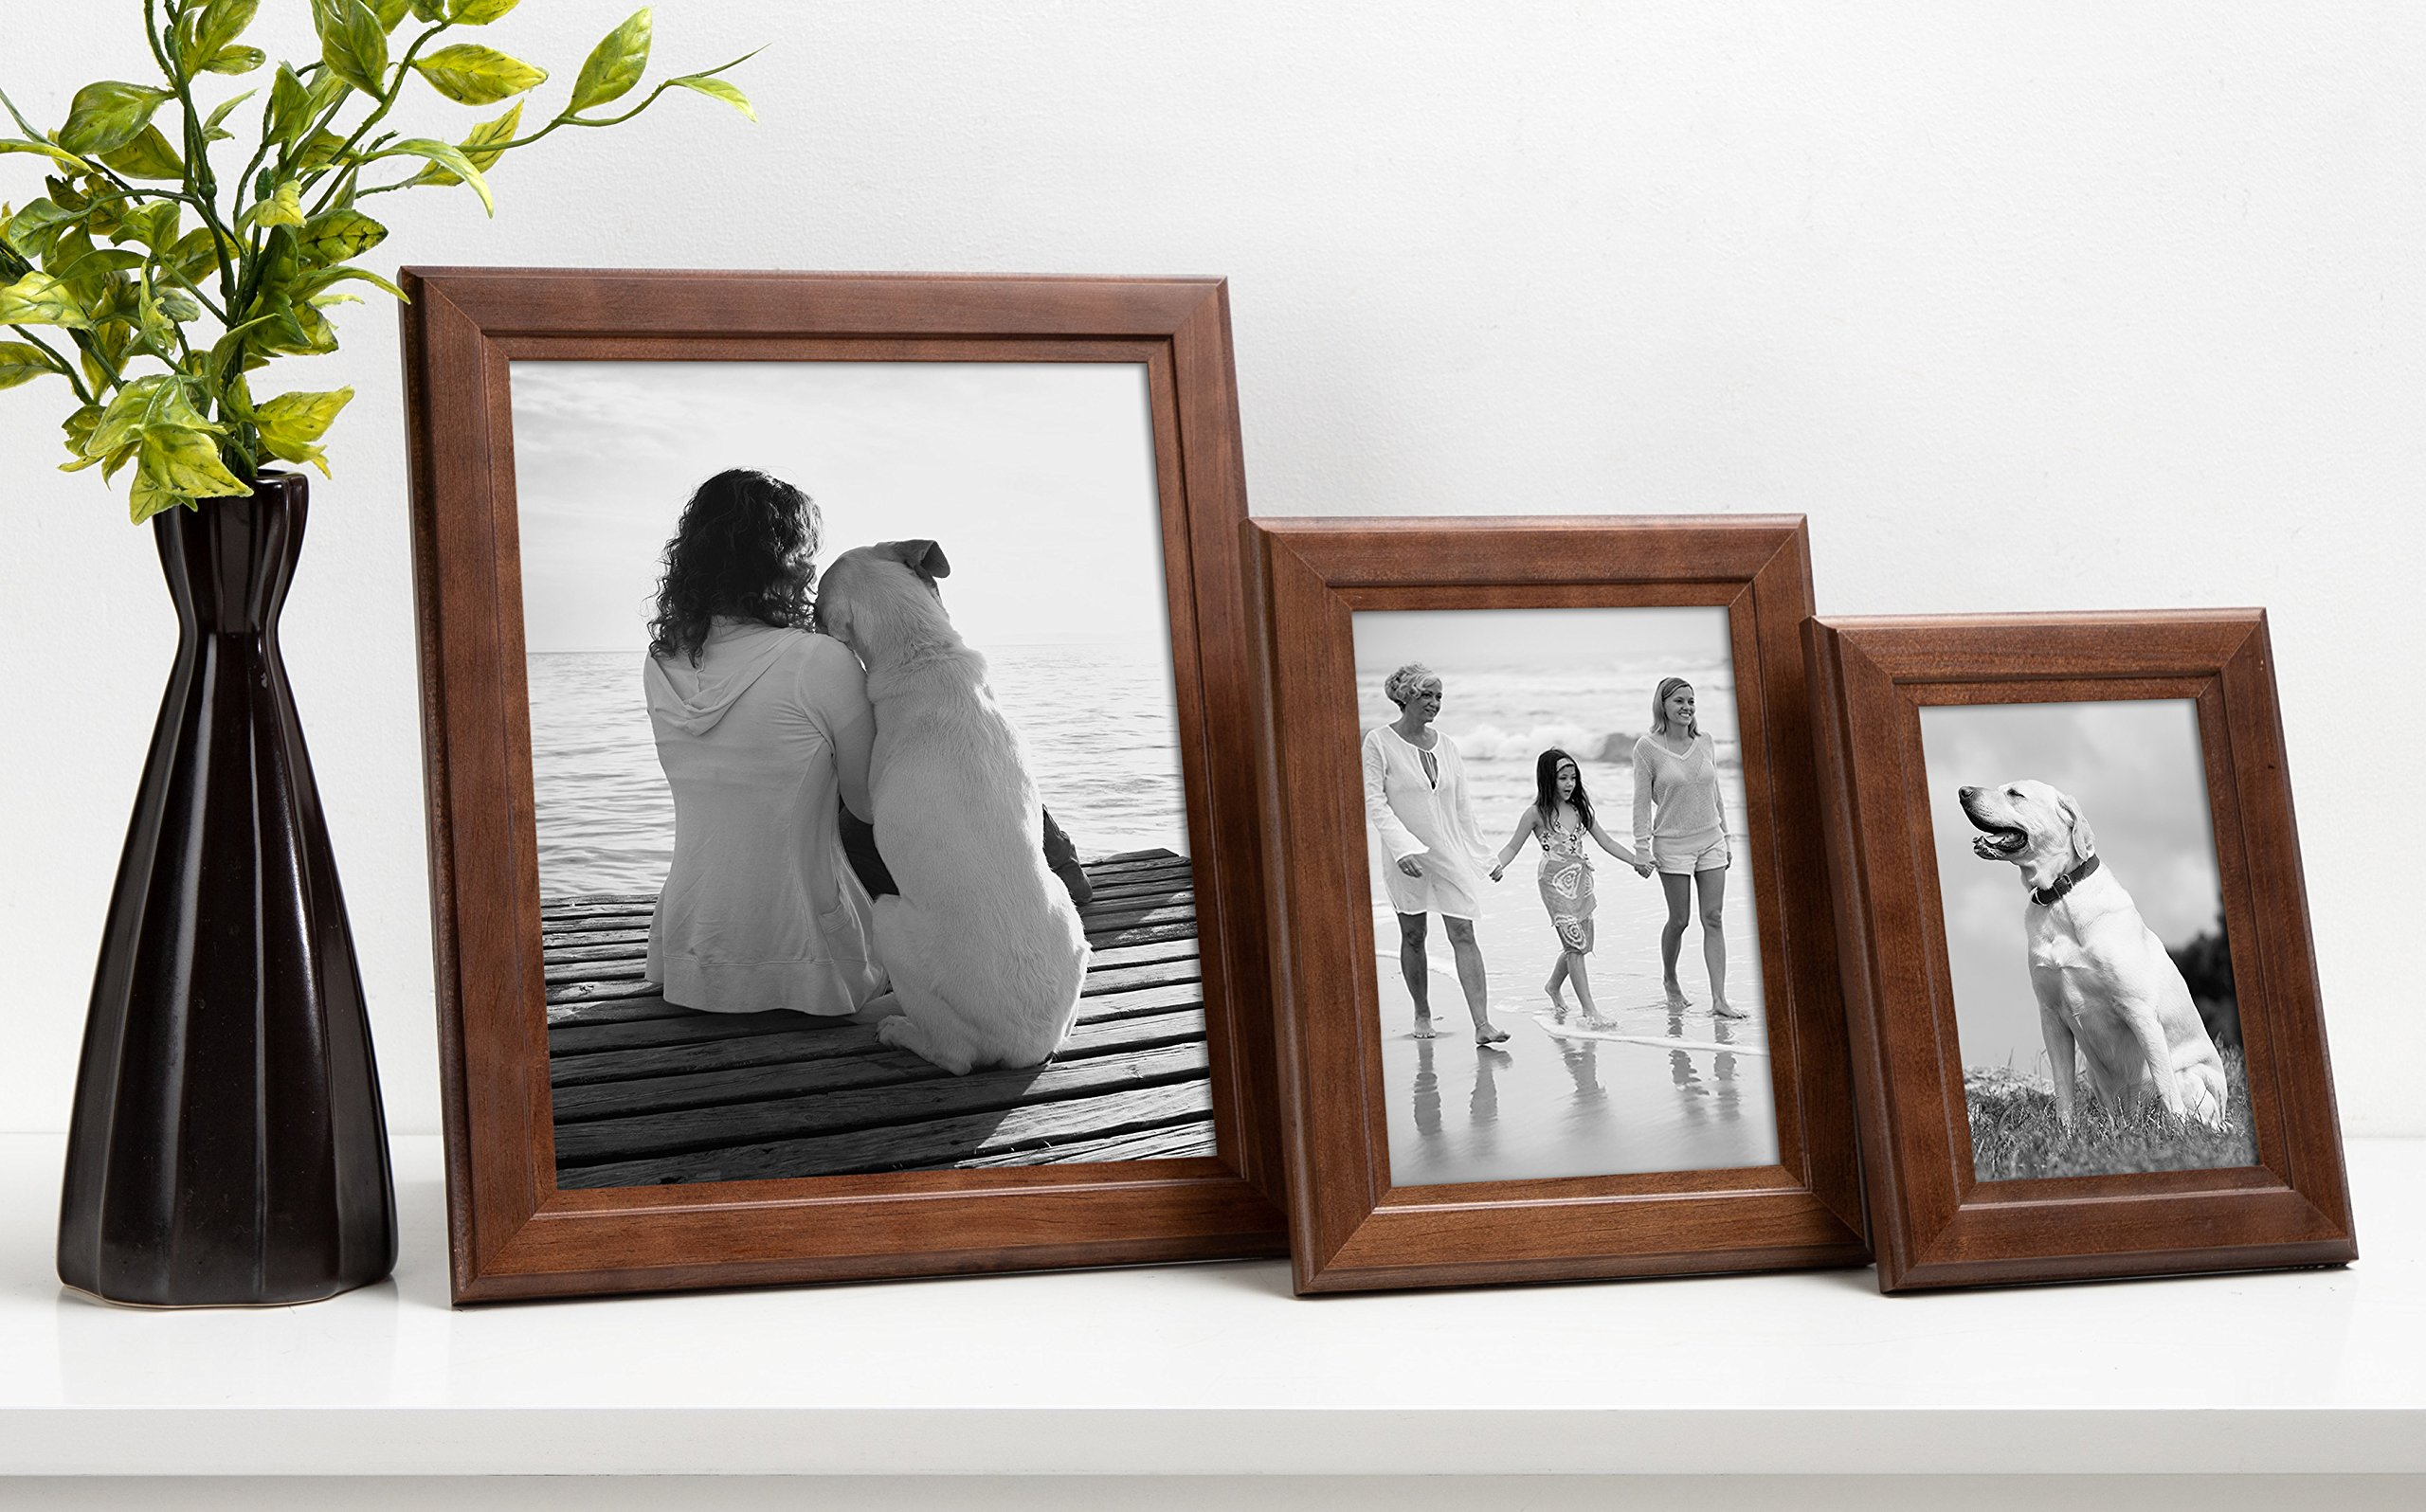 DesignOvation Kieva Solid Wood Picture Frames, Espresso Brown 8x10, Pack of 6 by DesignOvation (Image #6)